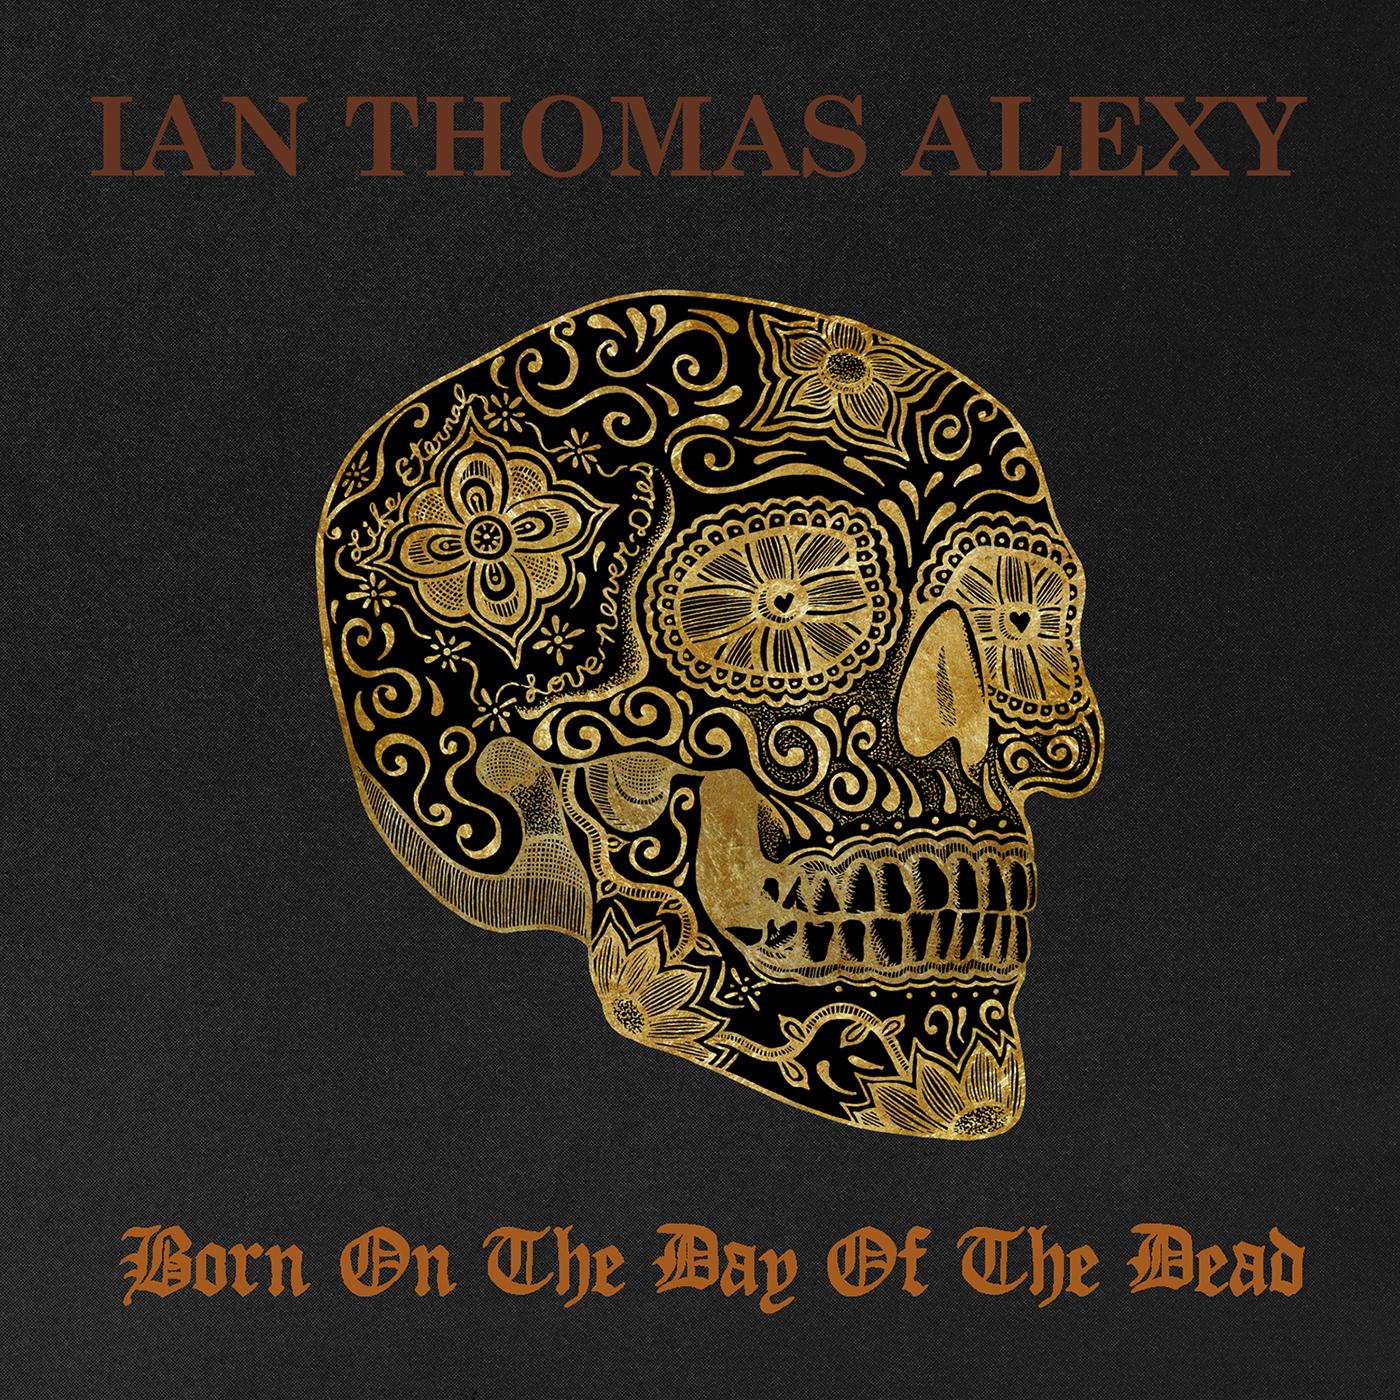 Ian Thomas Alexy - Born On The Day Of The Dead, 2012